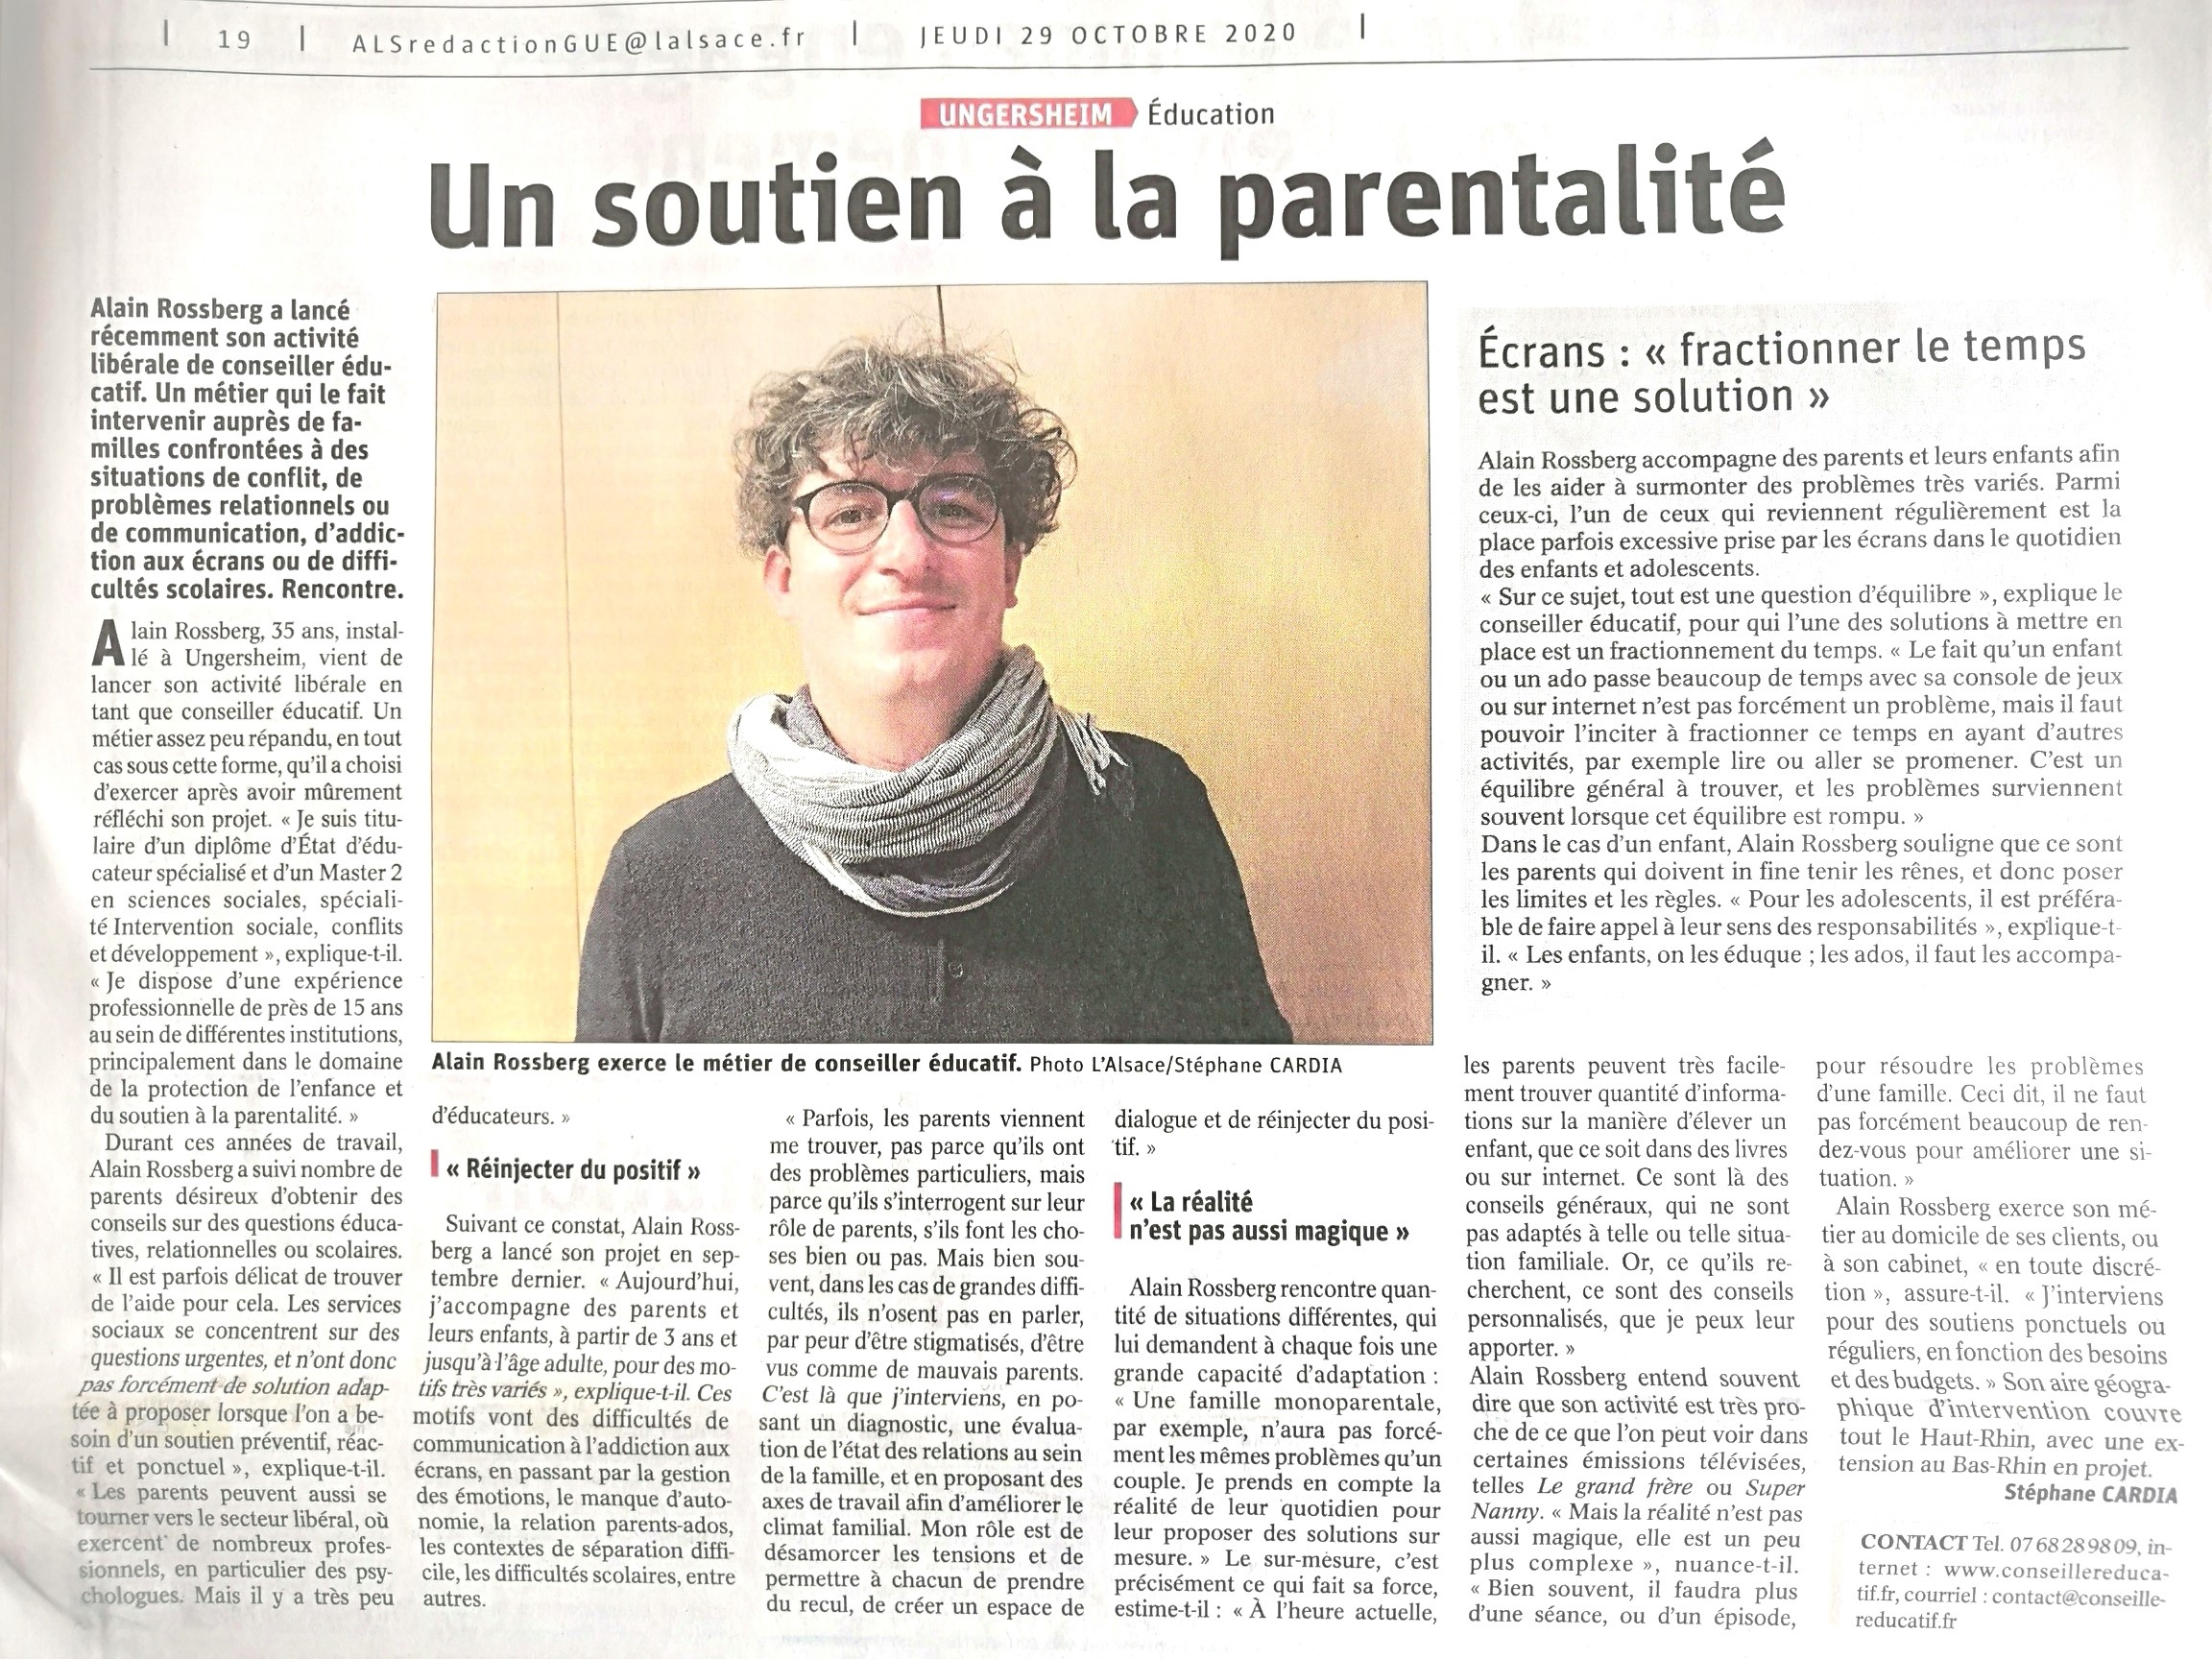 Article-de-presse-DNA-LALSACE-Presentation-Alain-ROSSBERG-Conseiller-Educatif-29.10.2020